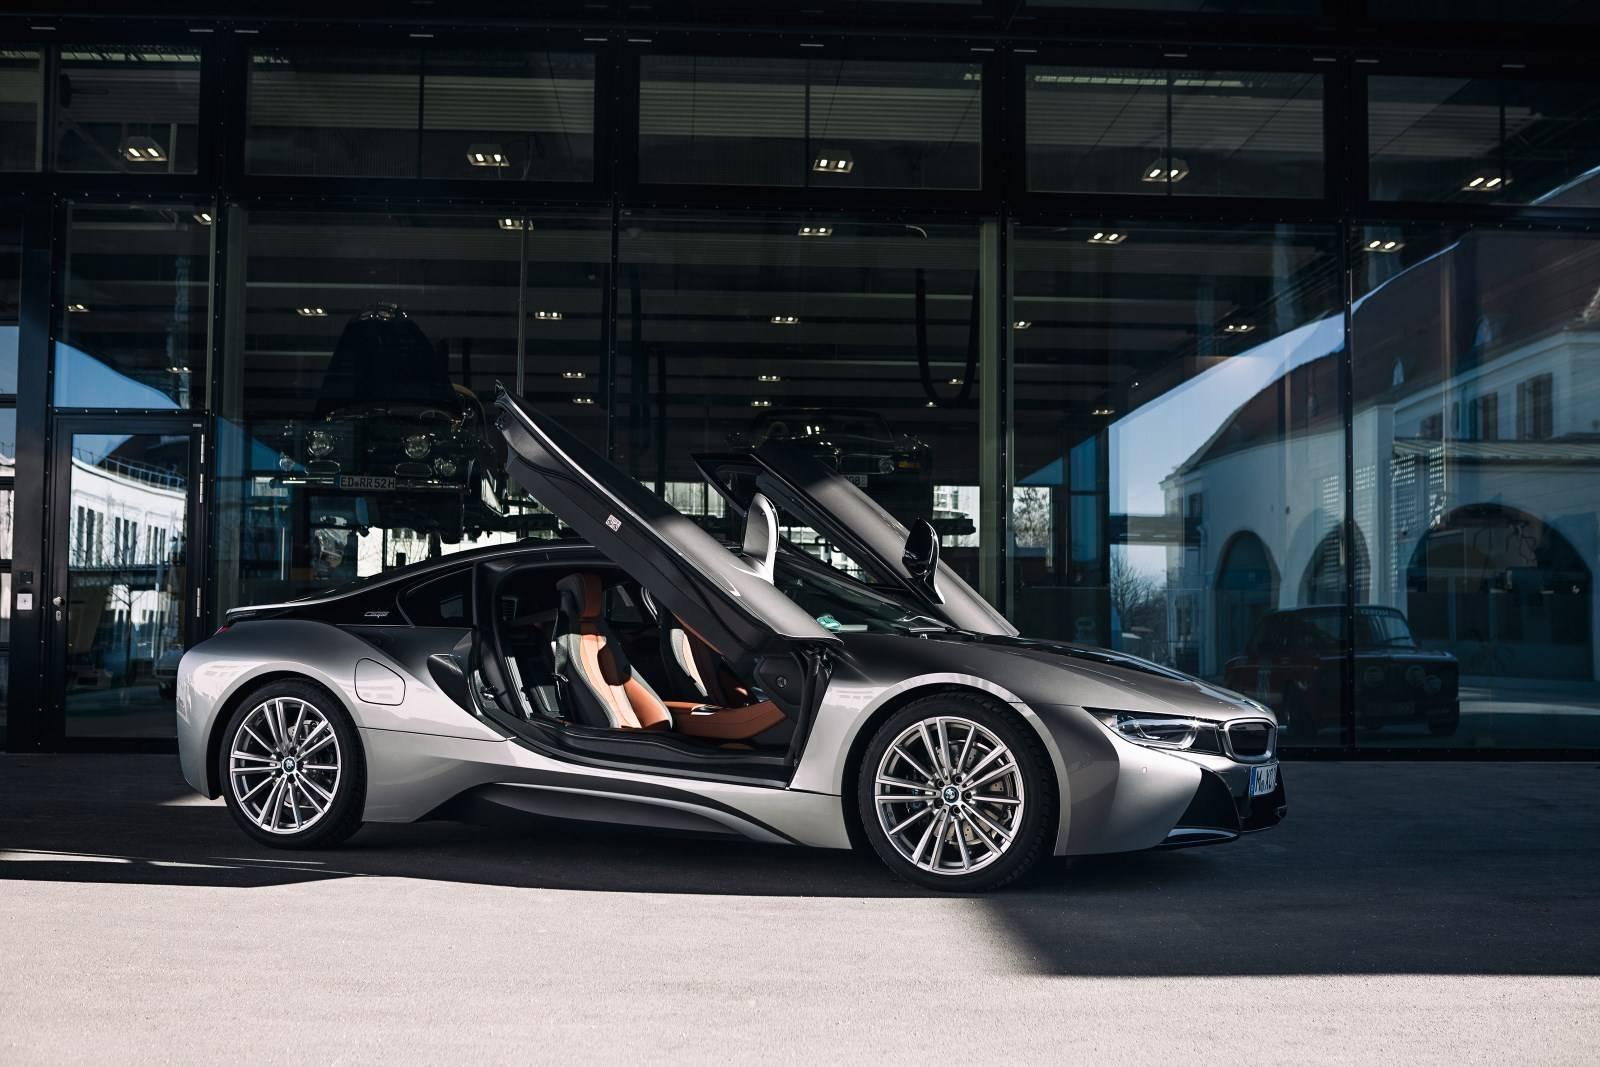 BMW i8 уходит в музей - BMW Group прекращает производство гибрида 2